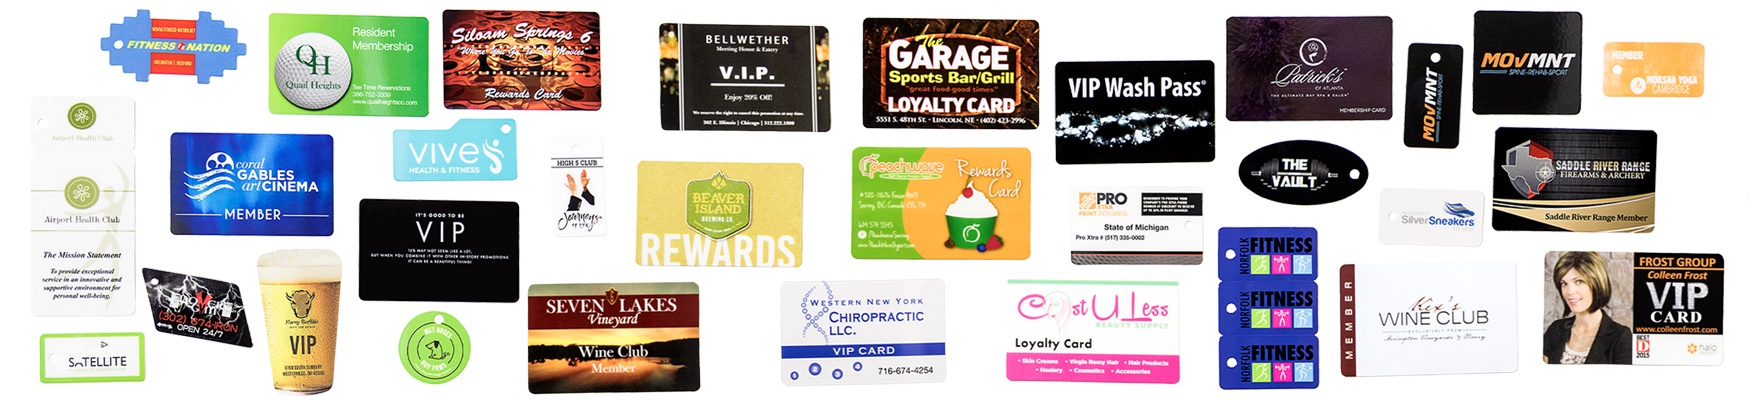 Membership-VIP-Rewards-Banner-1750x400.jpg